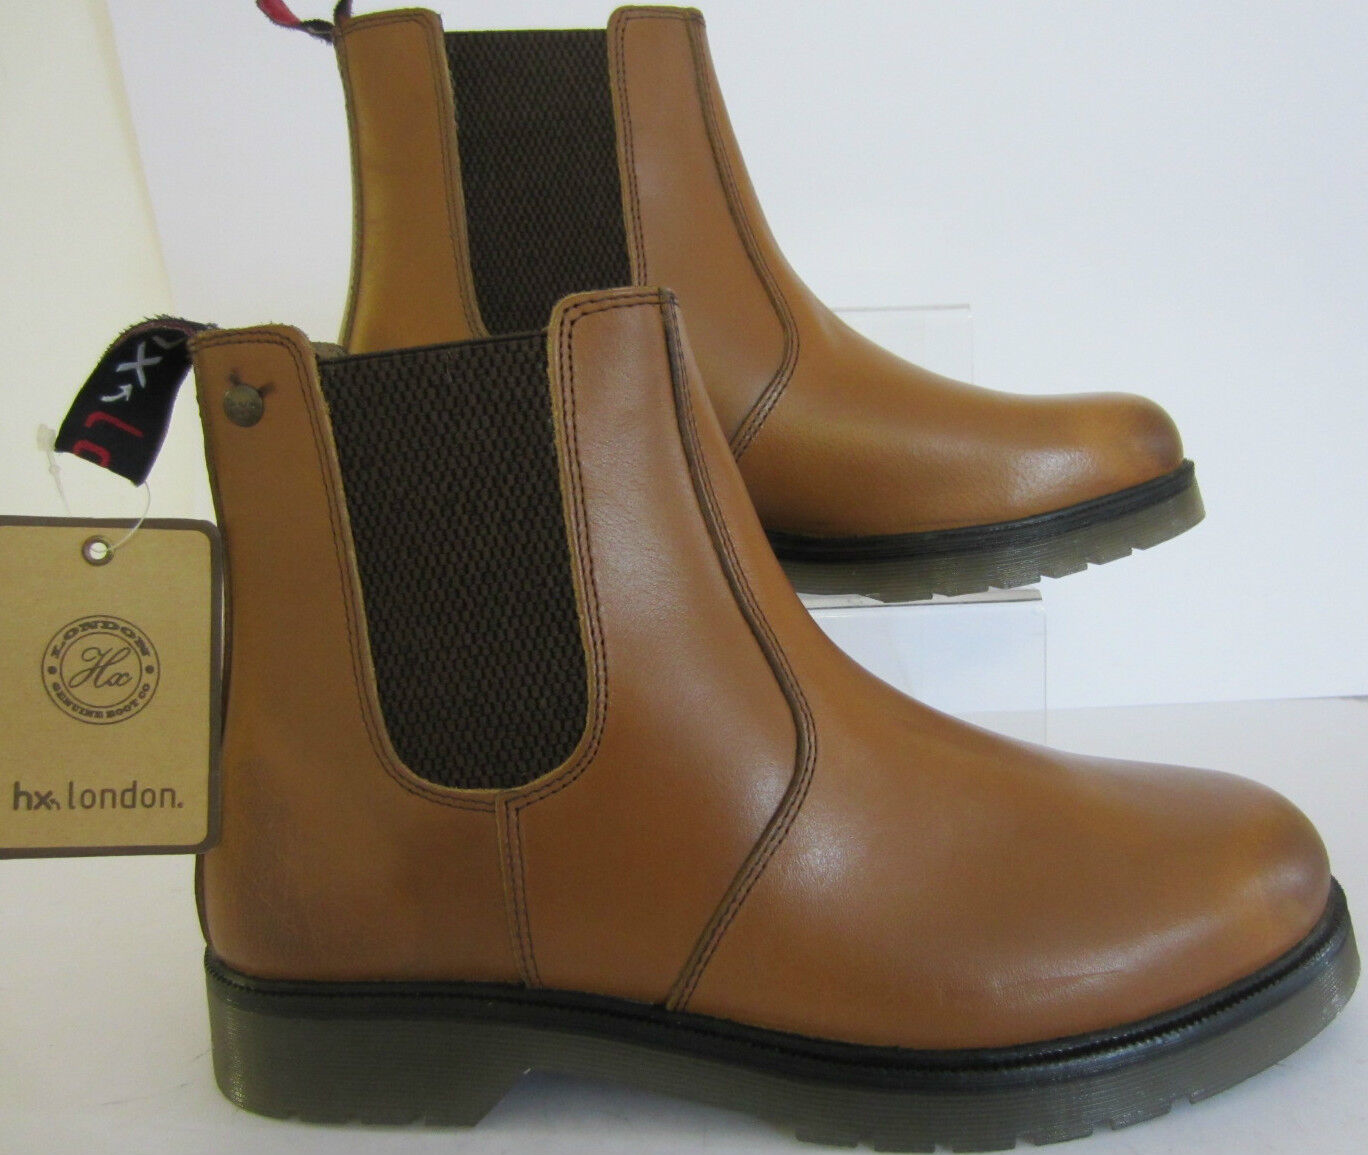 hx, london Mens Smart Chelsea Boot (01700) Tan  Sizes  7 x 10   Sizes & 42 (MR) 5f635e